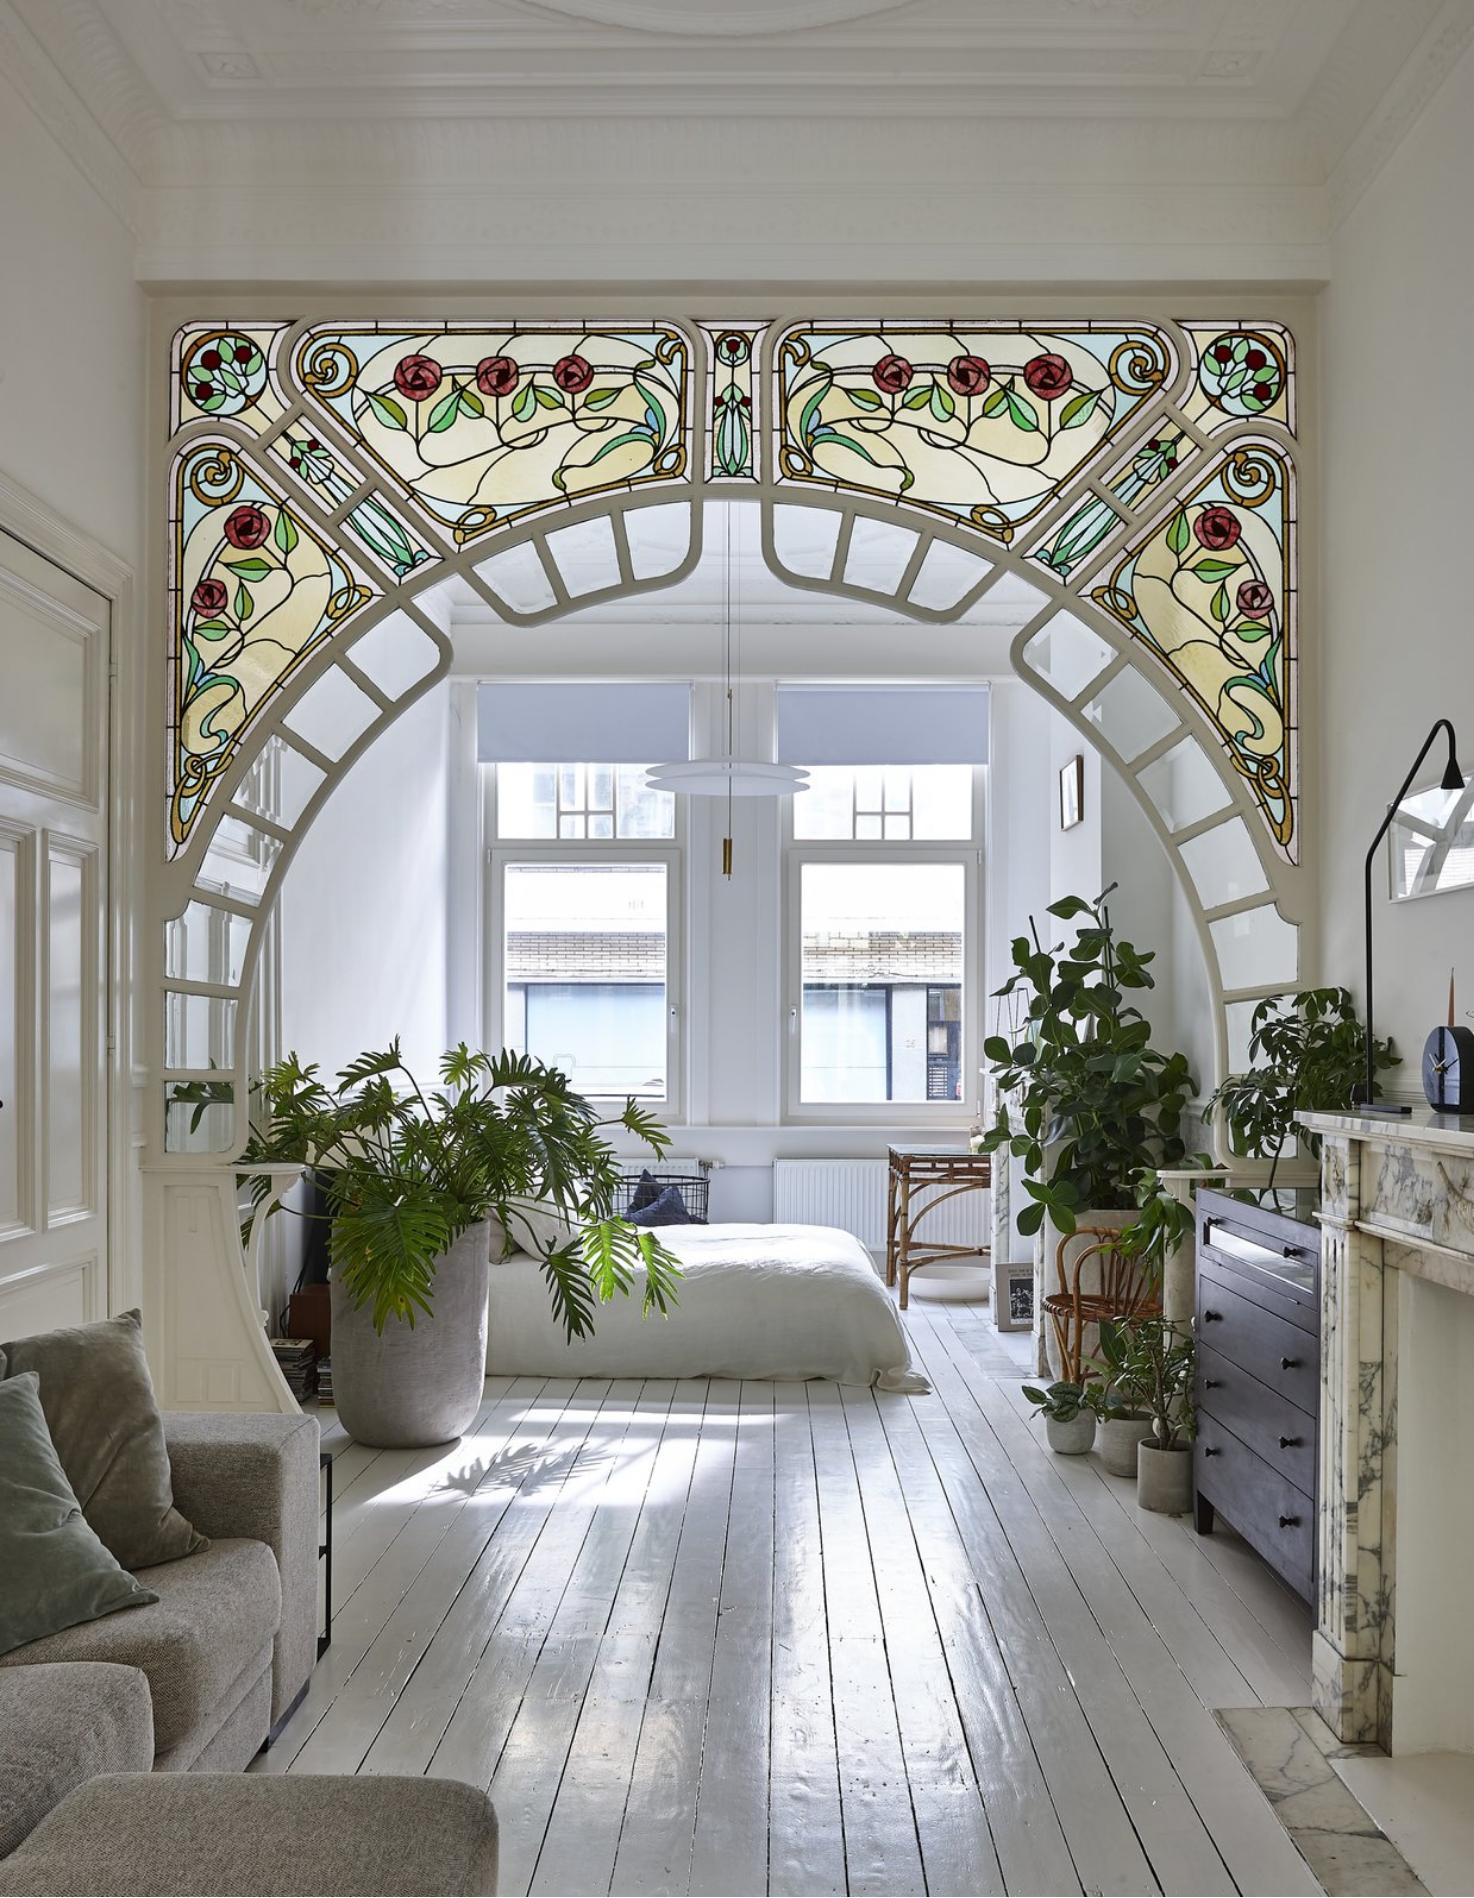 (Dwell, Jan Verlinde/Living House)